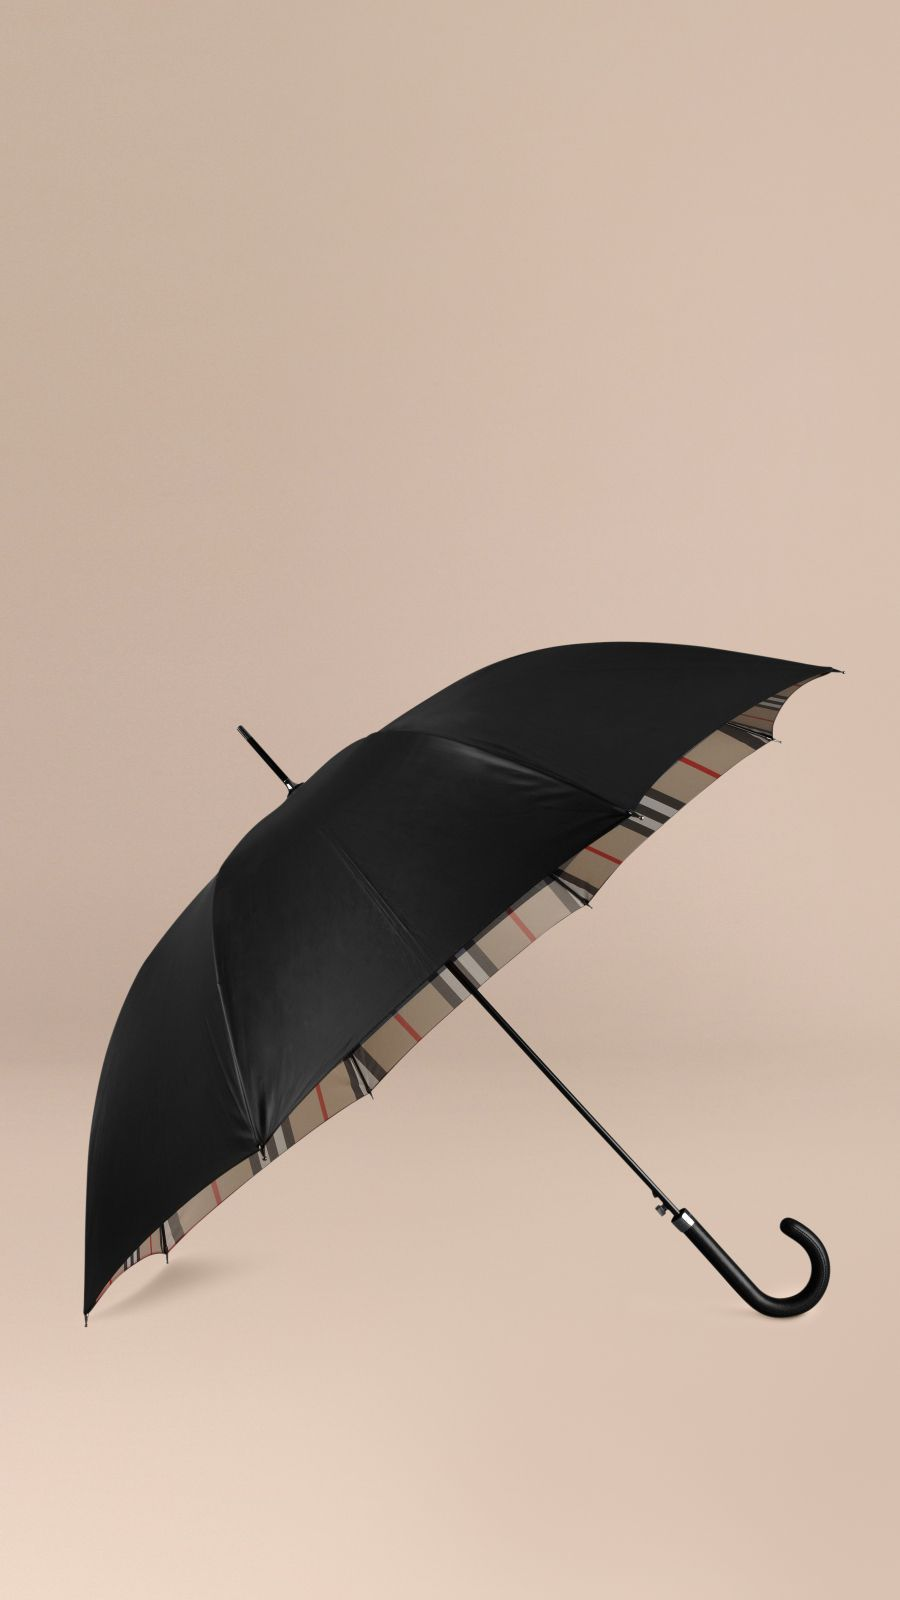 Black camel check Check-Lined Walking Umbrella Black Camel - Image 1